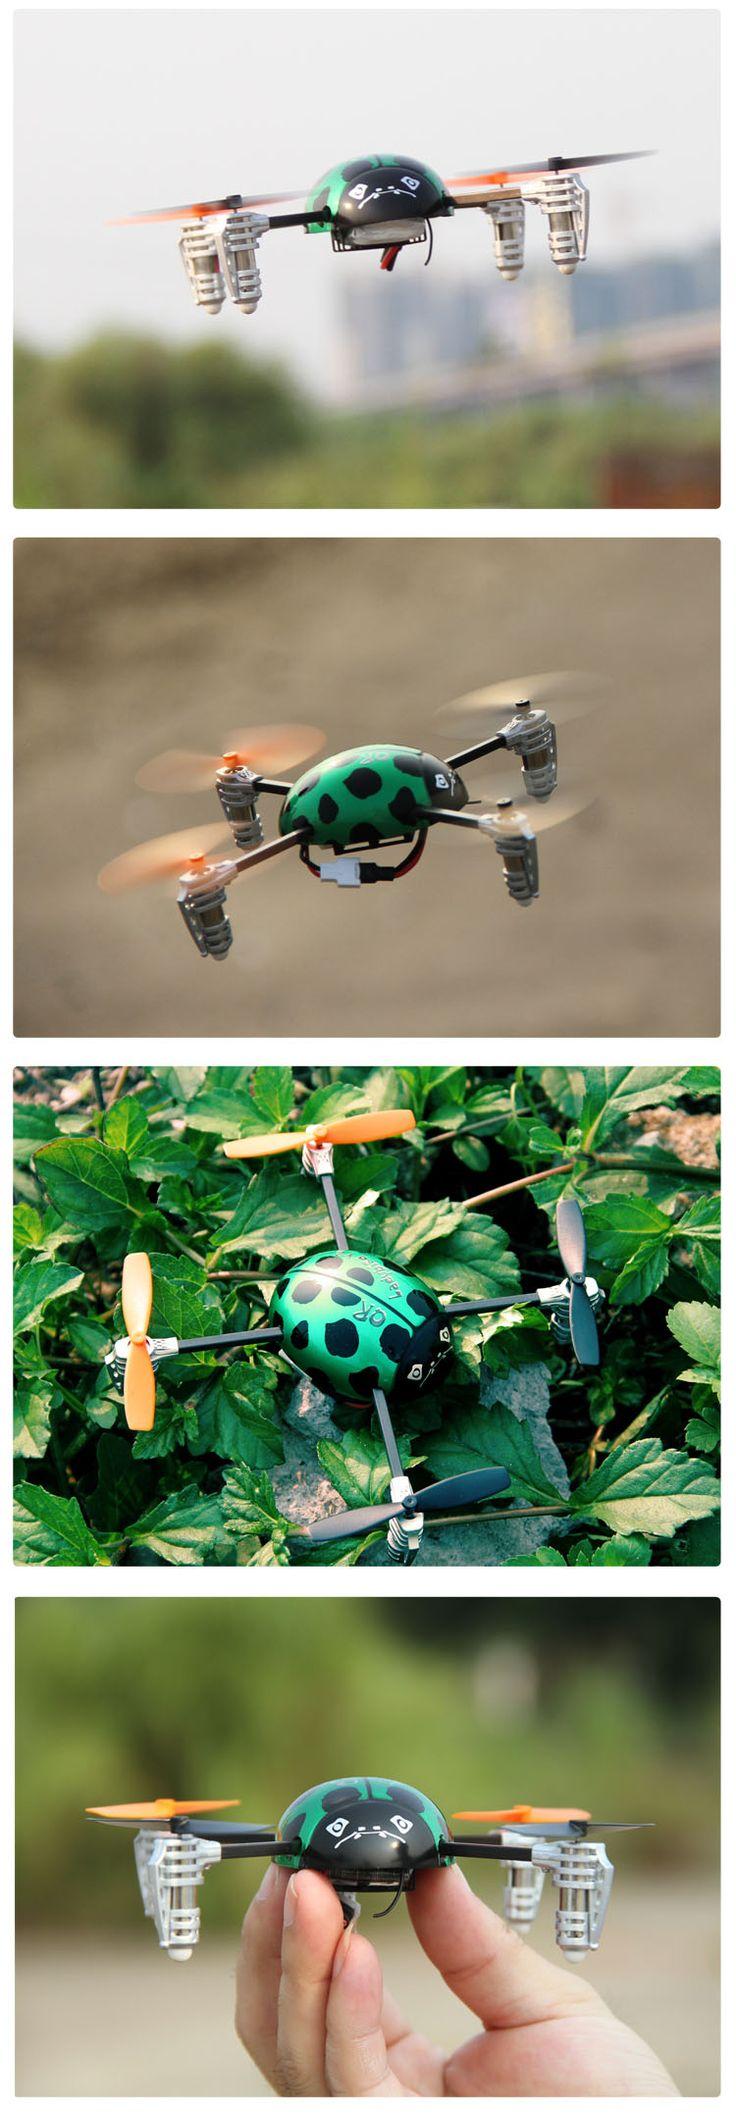 Walkera QR Ladybird [ store.helivideopros.com ] #drone #aerial #film